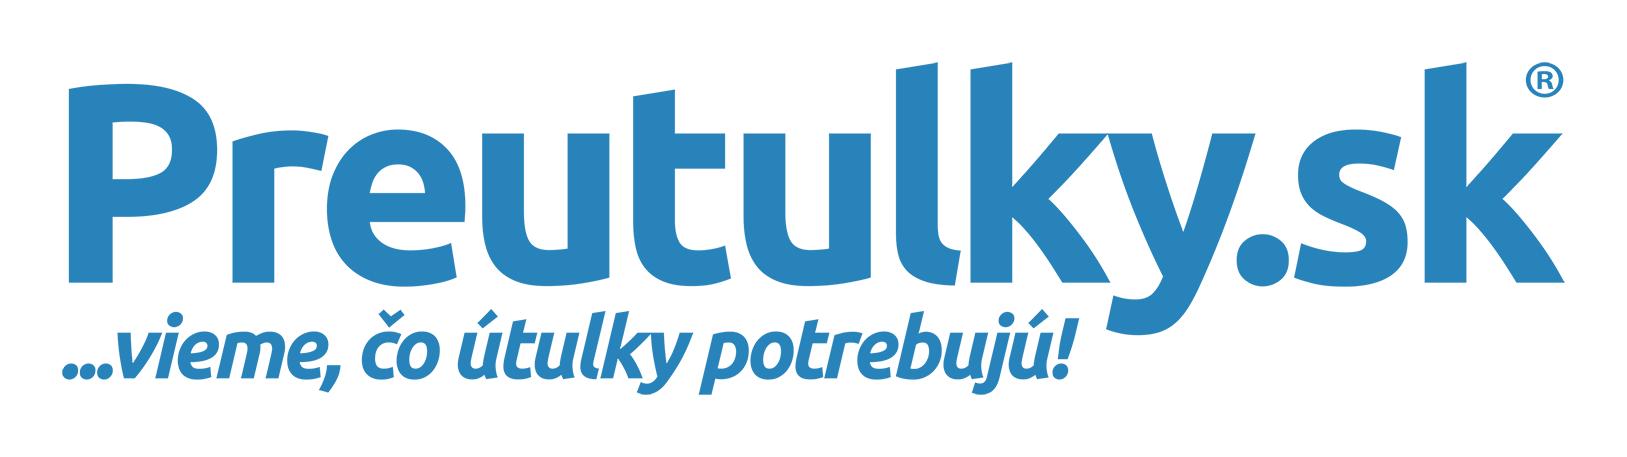 /images/com_odtatierkdunaju/teams/2021_Preutulky-sk.png